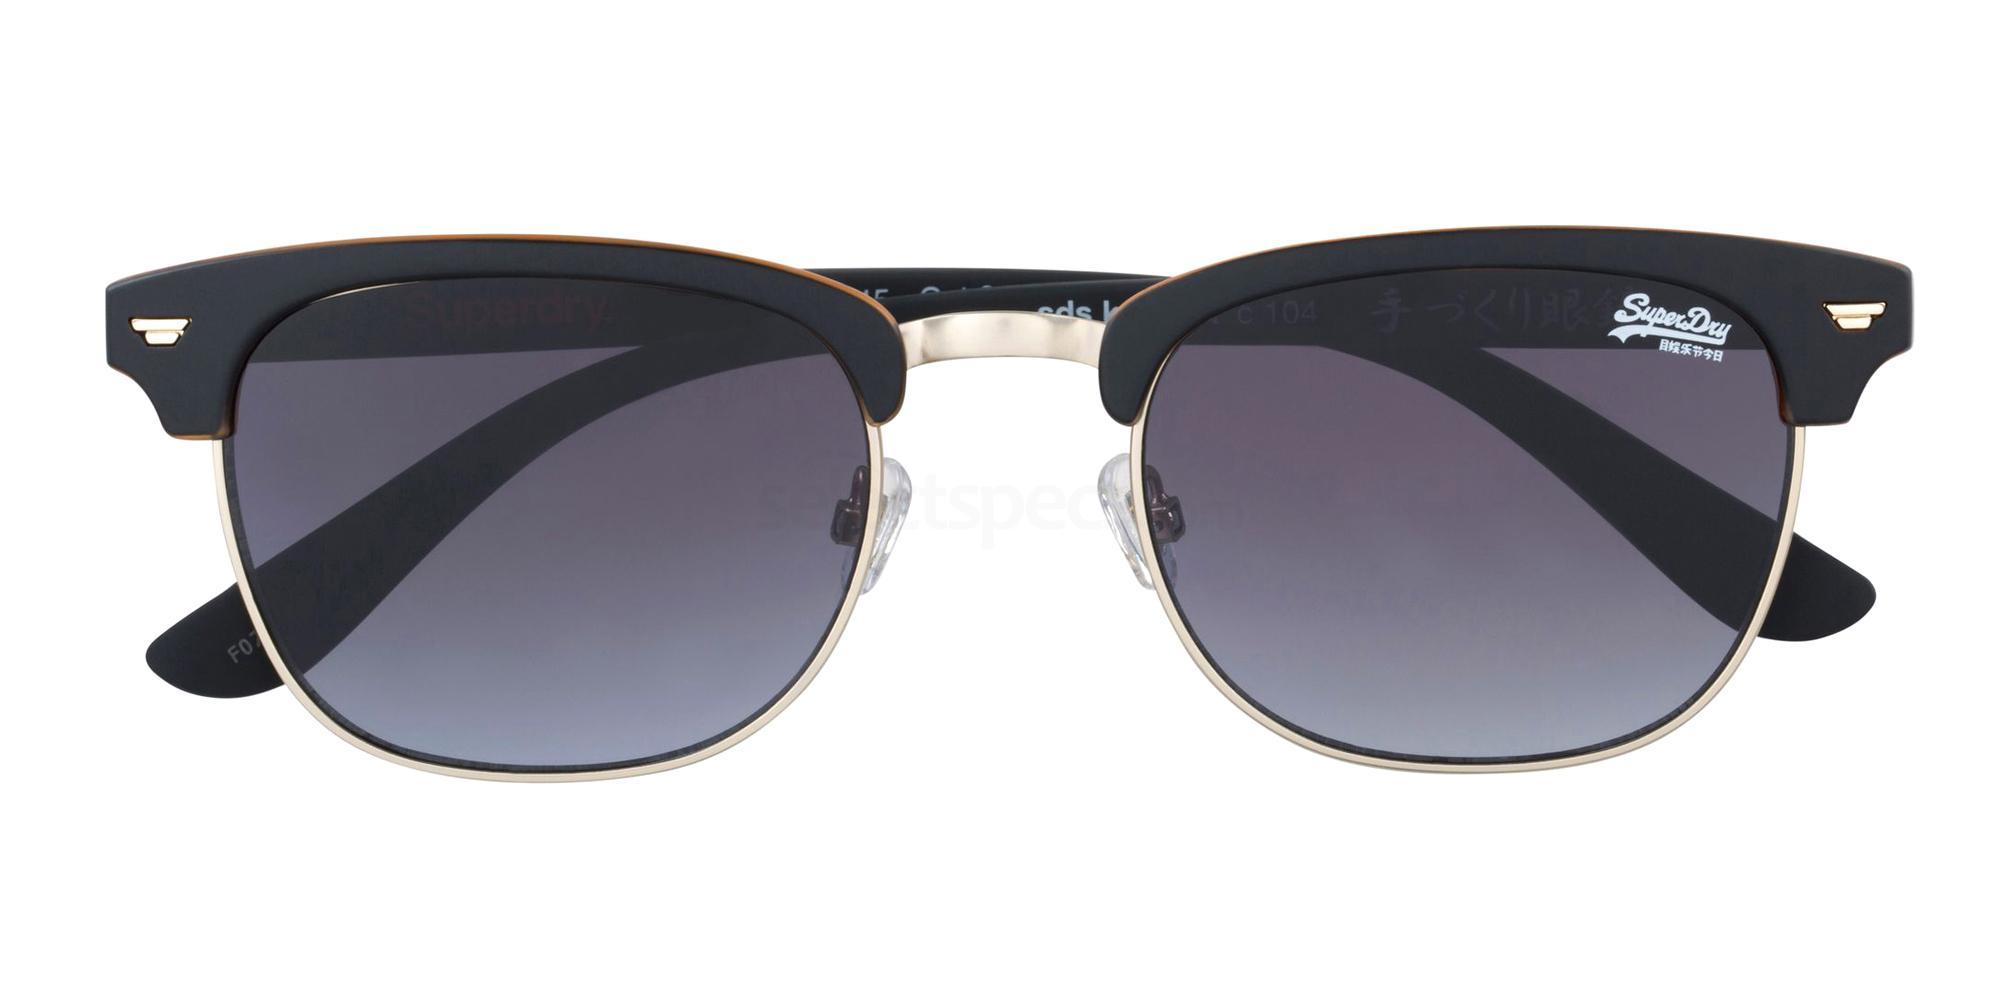 104 SDS-KENDRIK Sunglasses, Superdry